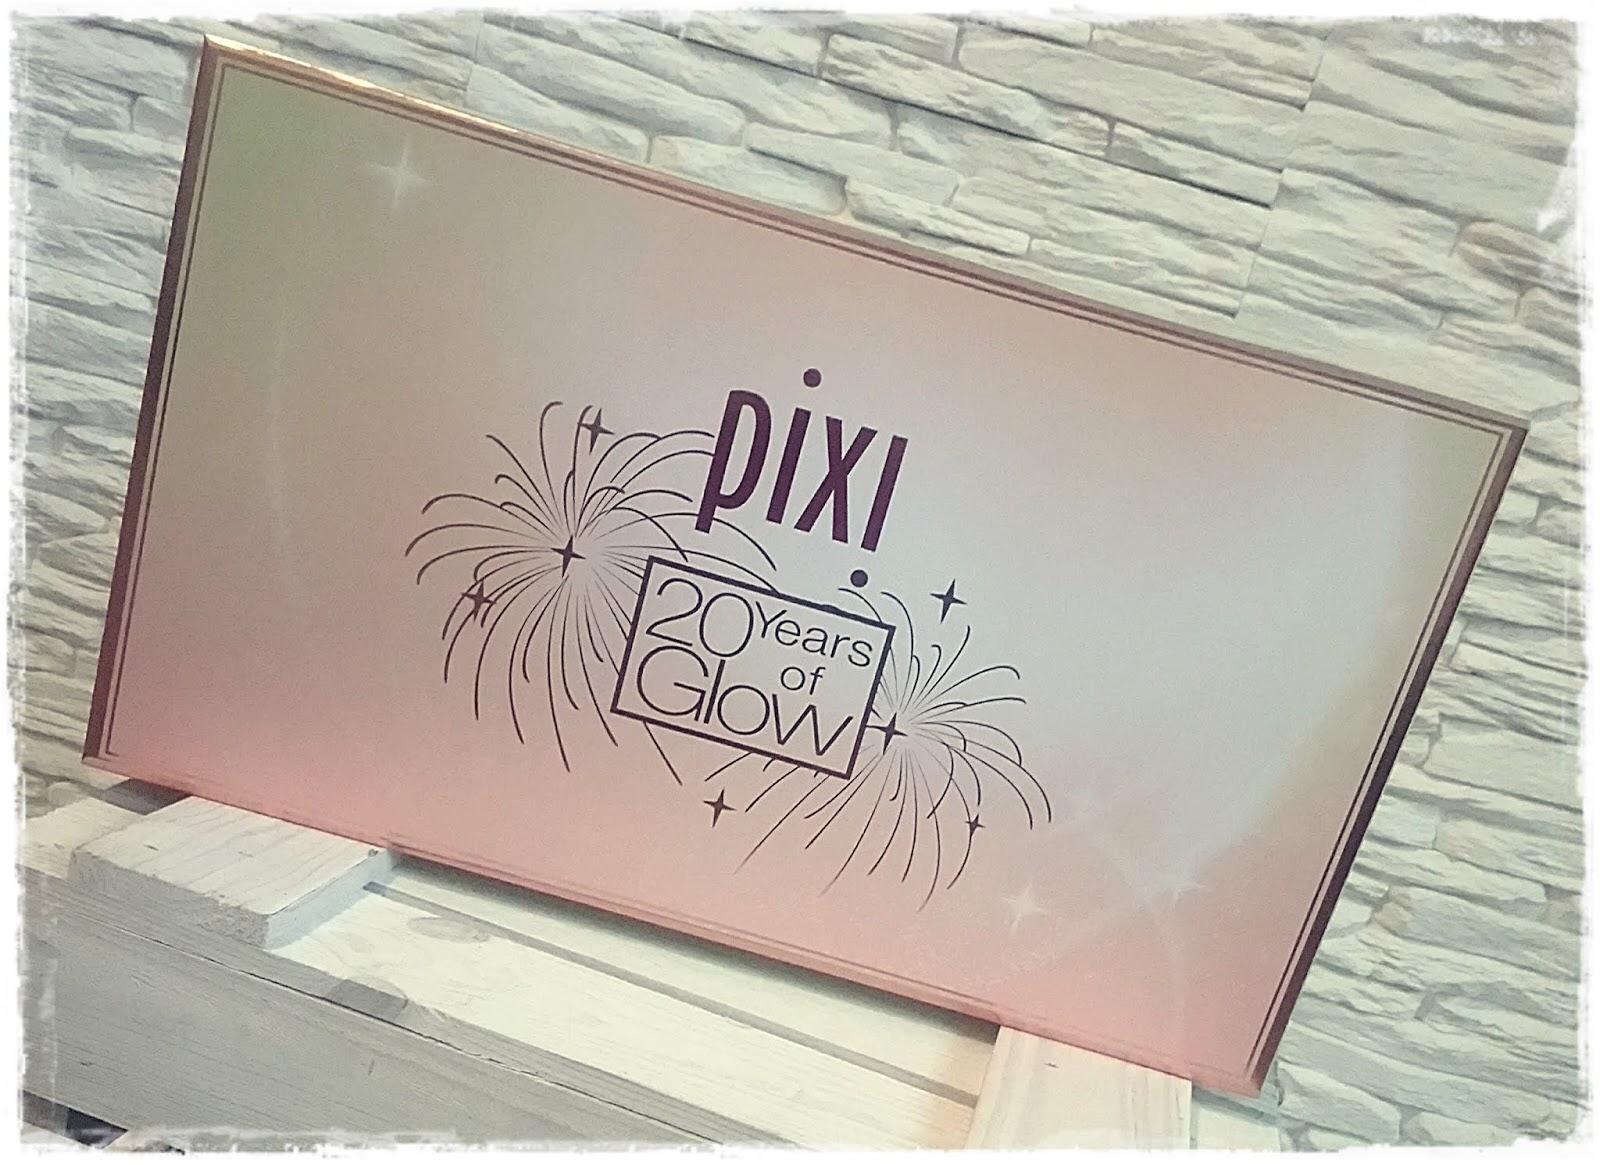 Pixie beauty, pixi, pixi glow